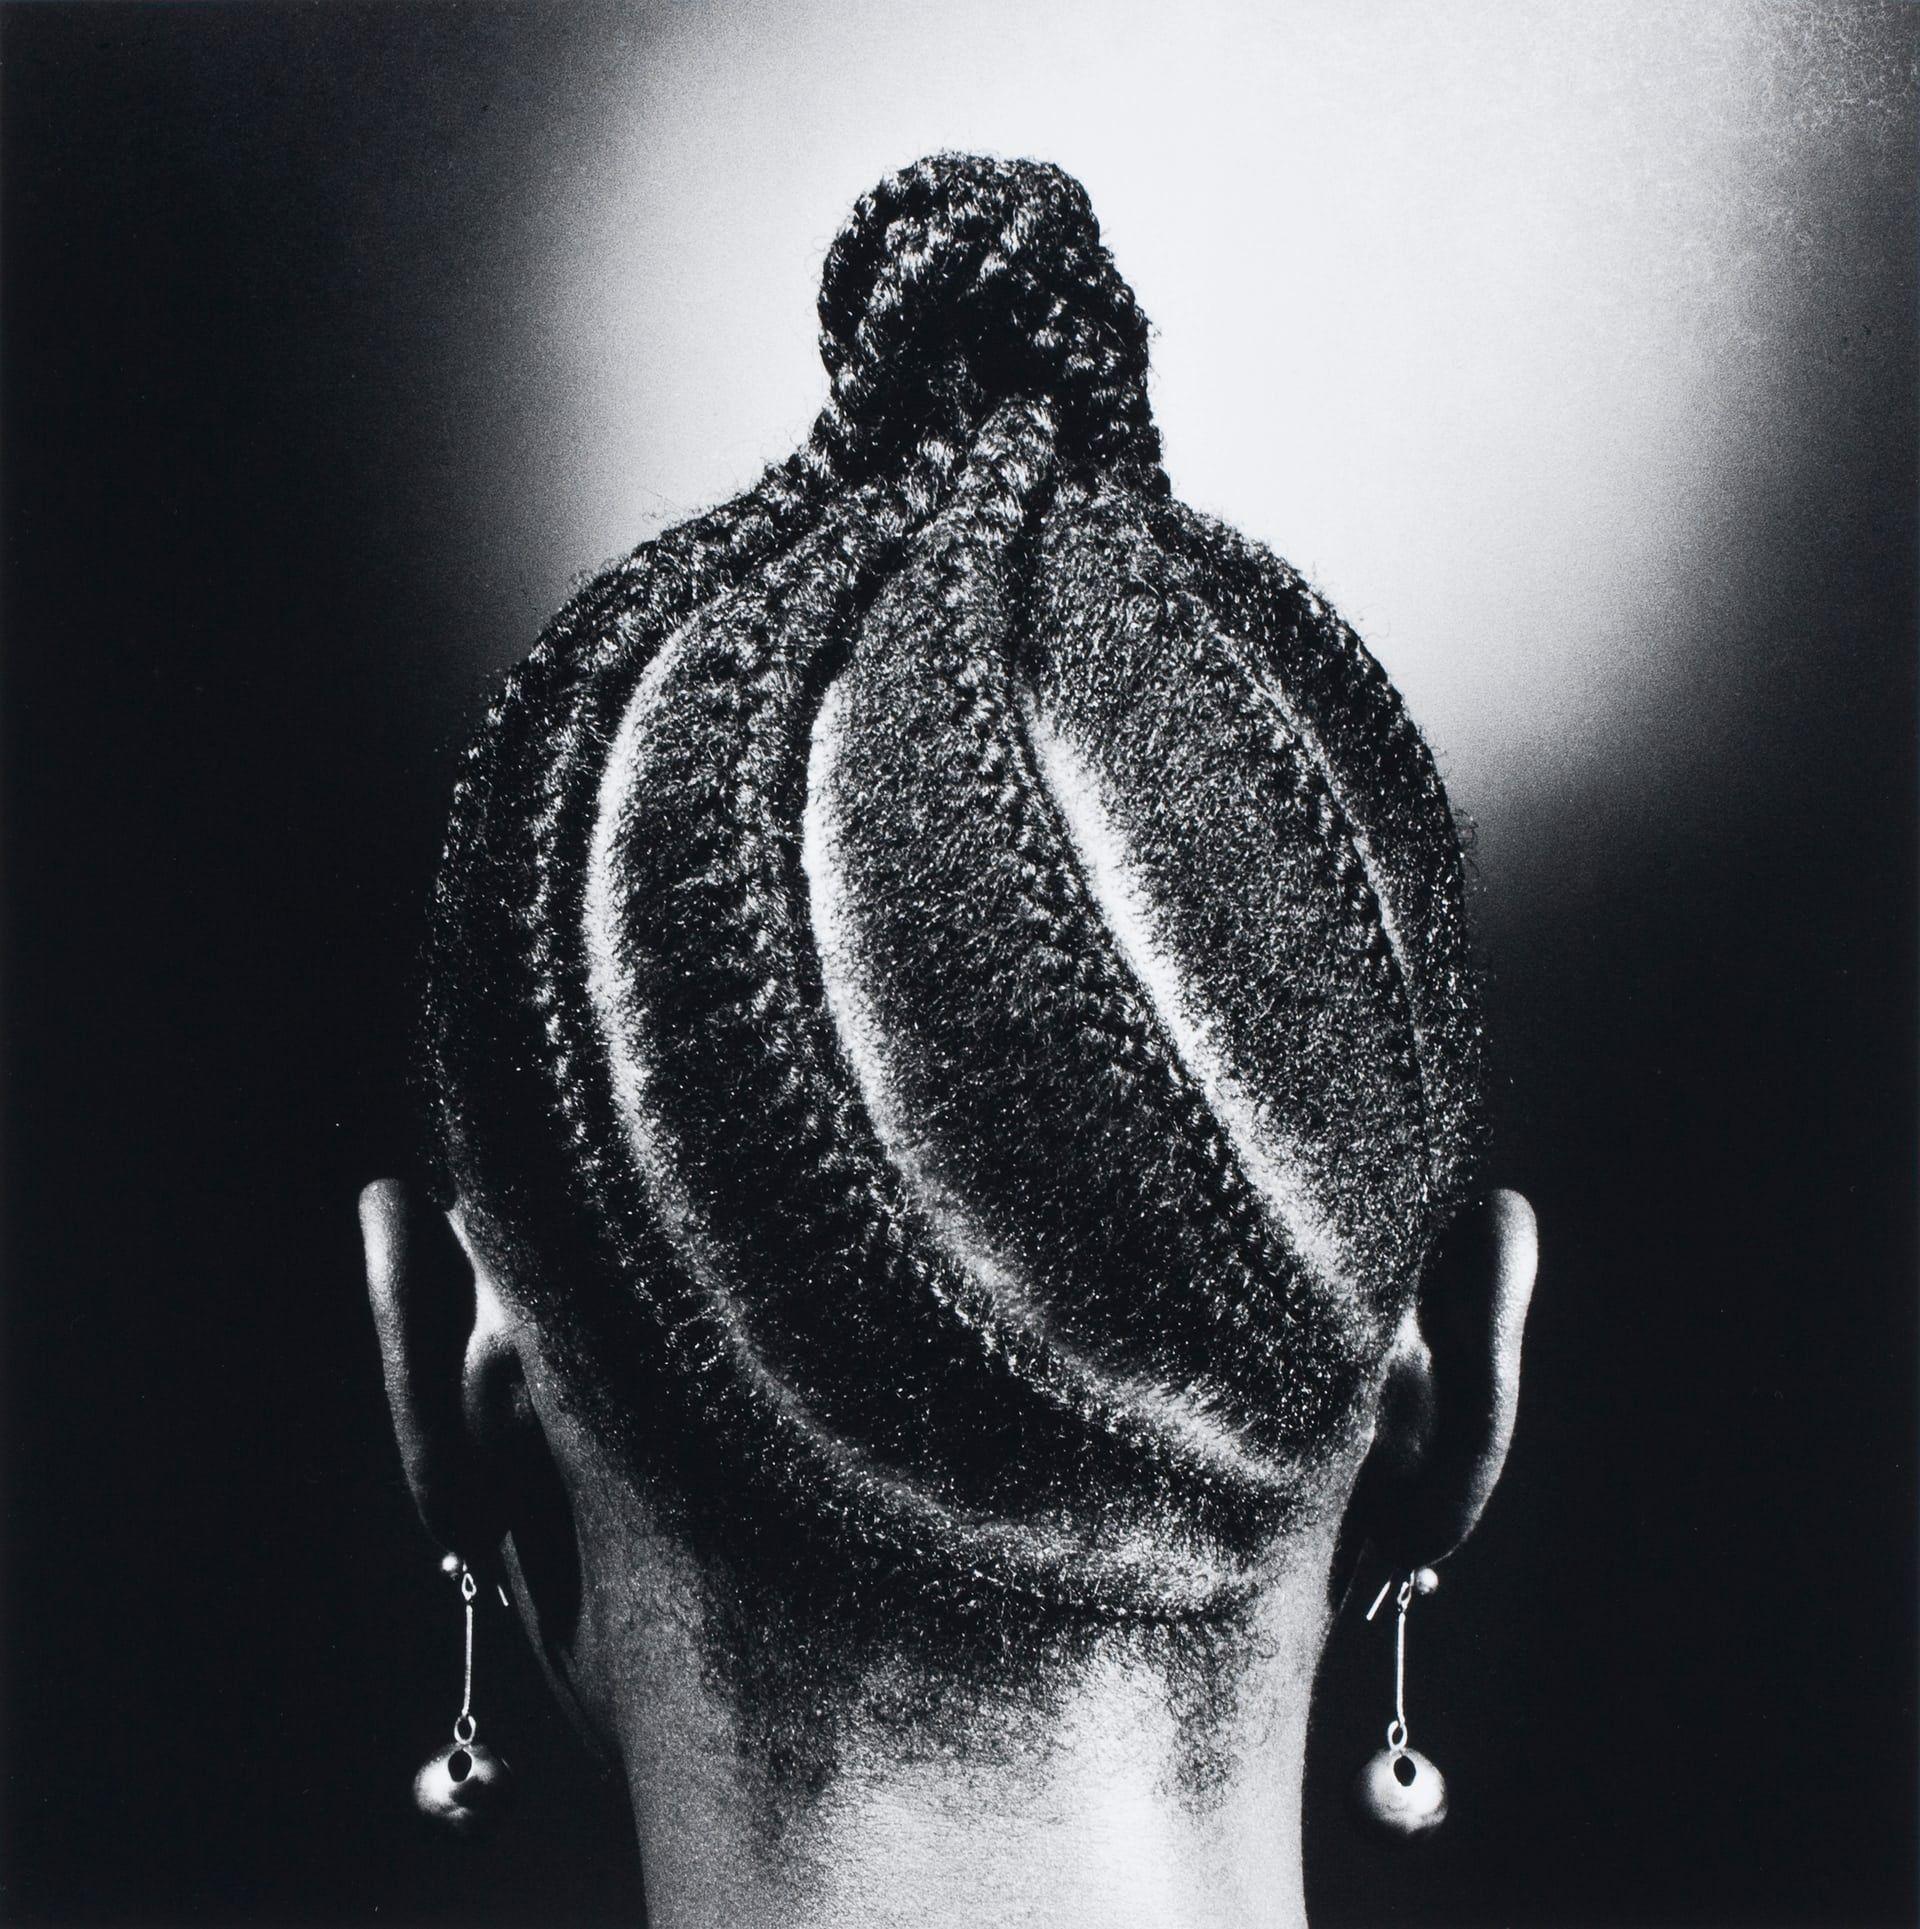 Nigerian Women S Elaborate Hairstyles In Pictures Nigerian Hair Style African Hairstyles African Braids Hairstyles